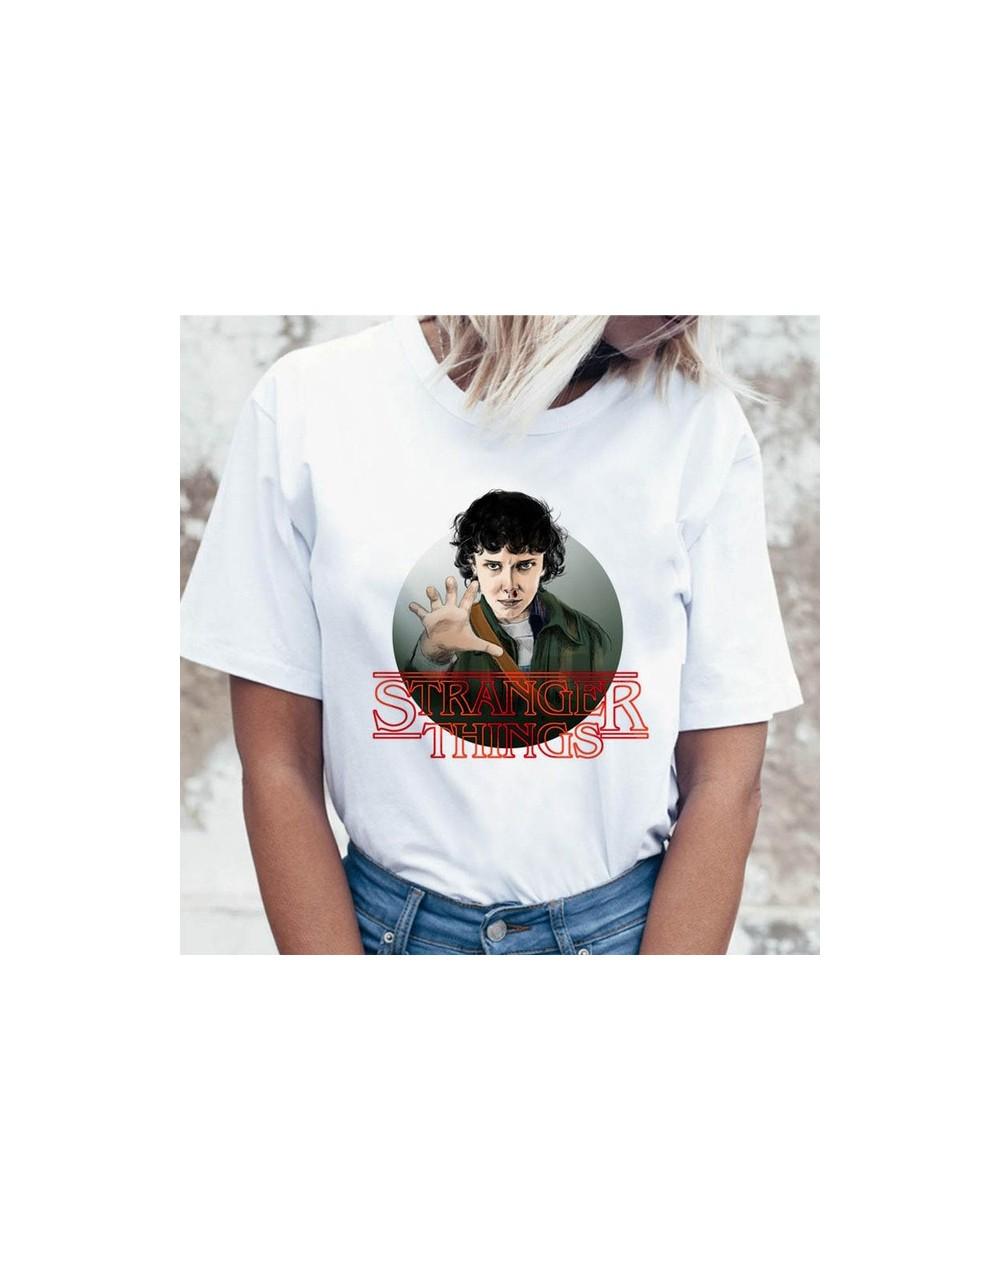 2019 Stranger Things TShirt Women Funny Tv Eleven Dustin Shirts Mike T shirt 80s Graphic Female Ulzzang T-shirt StrangerThin...